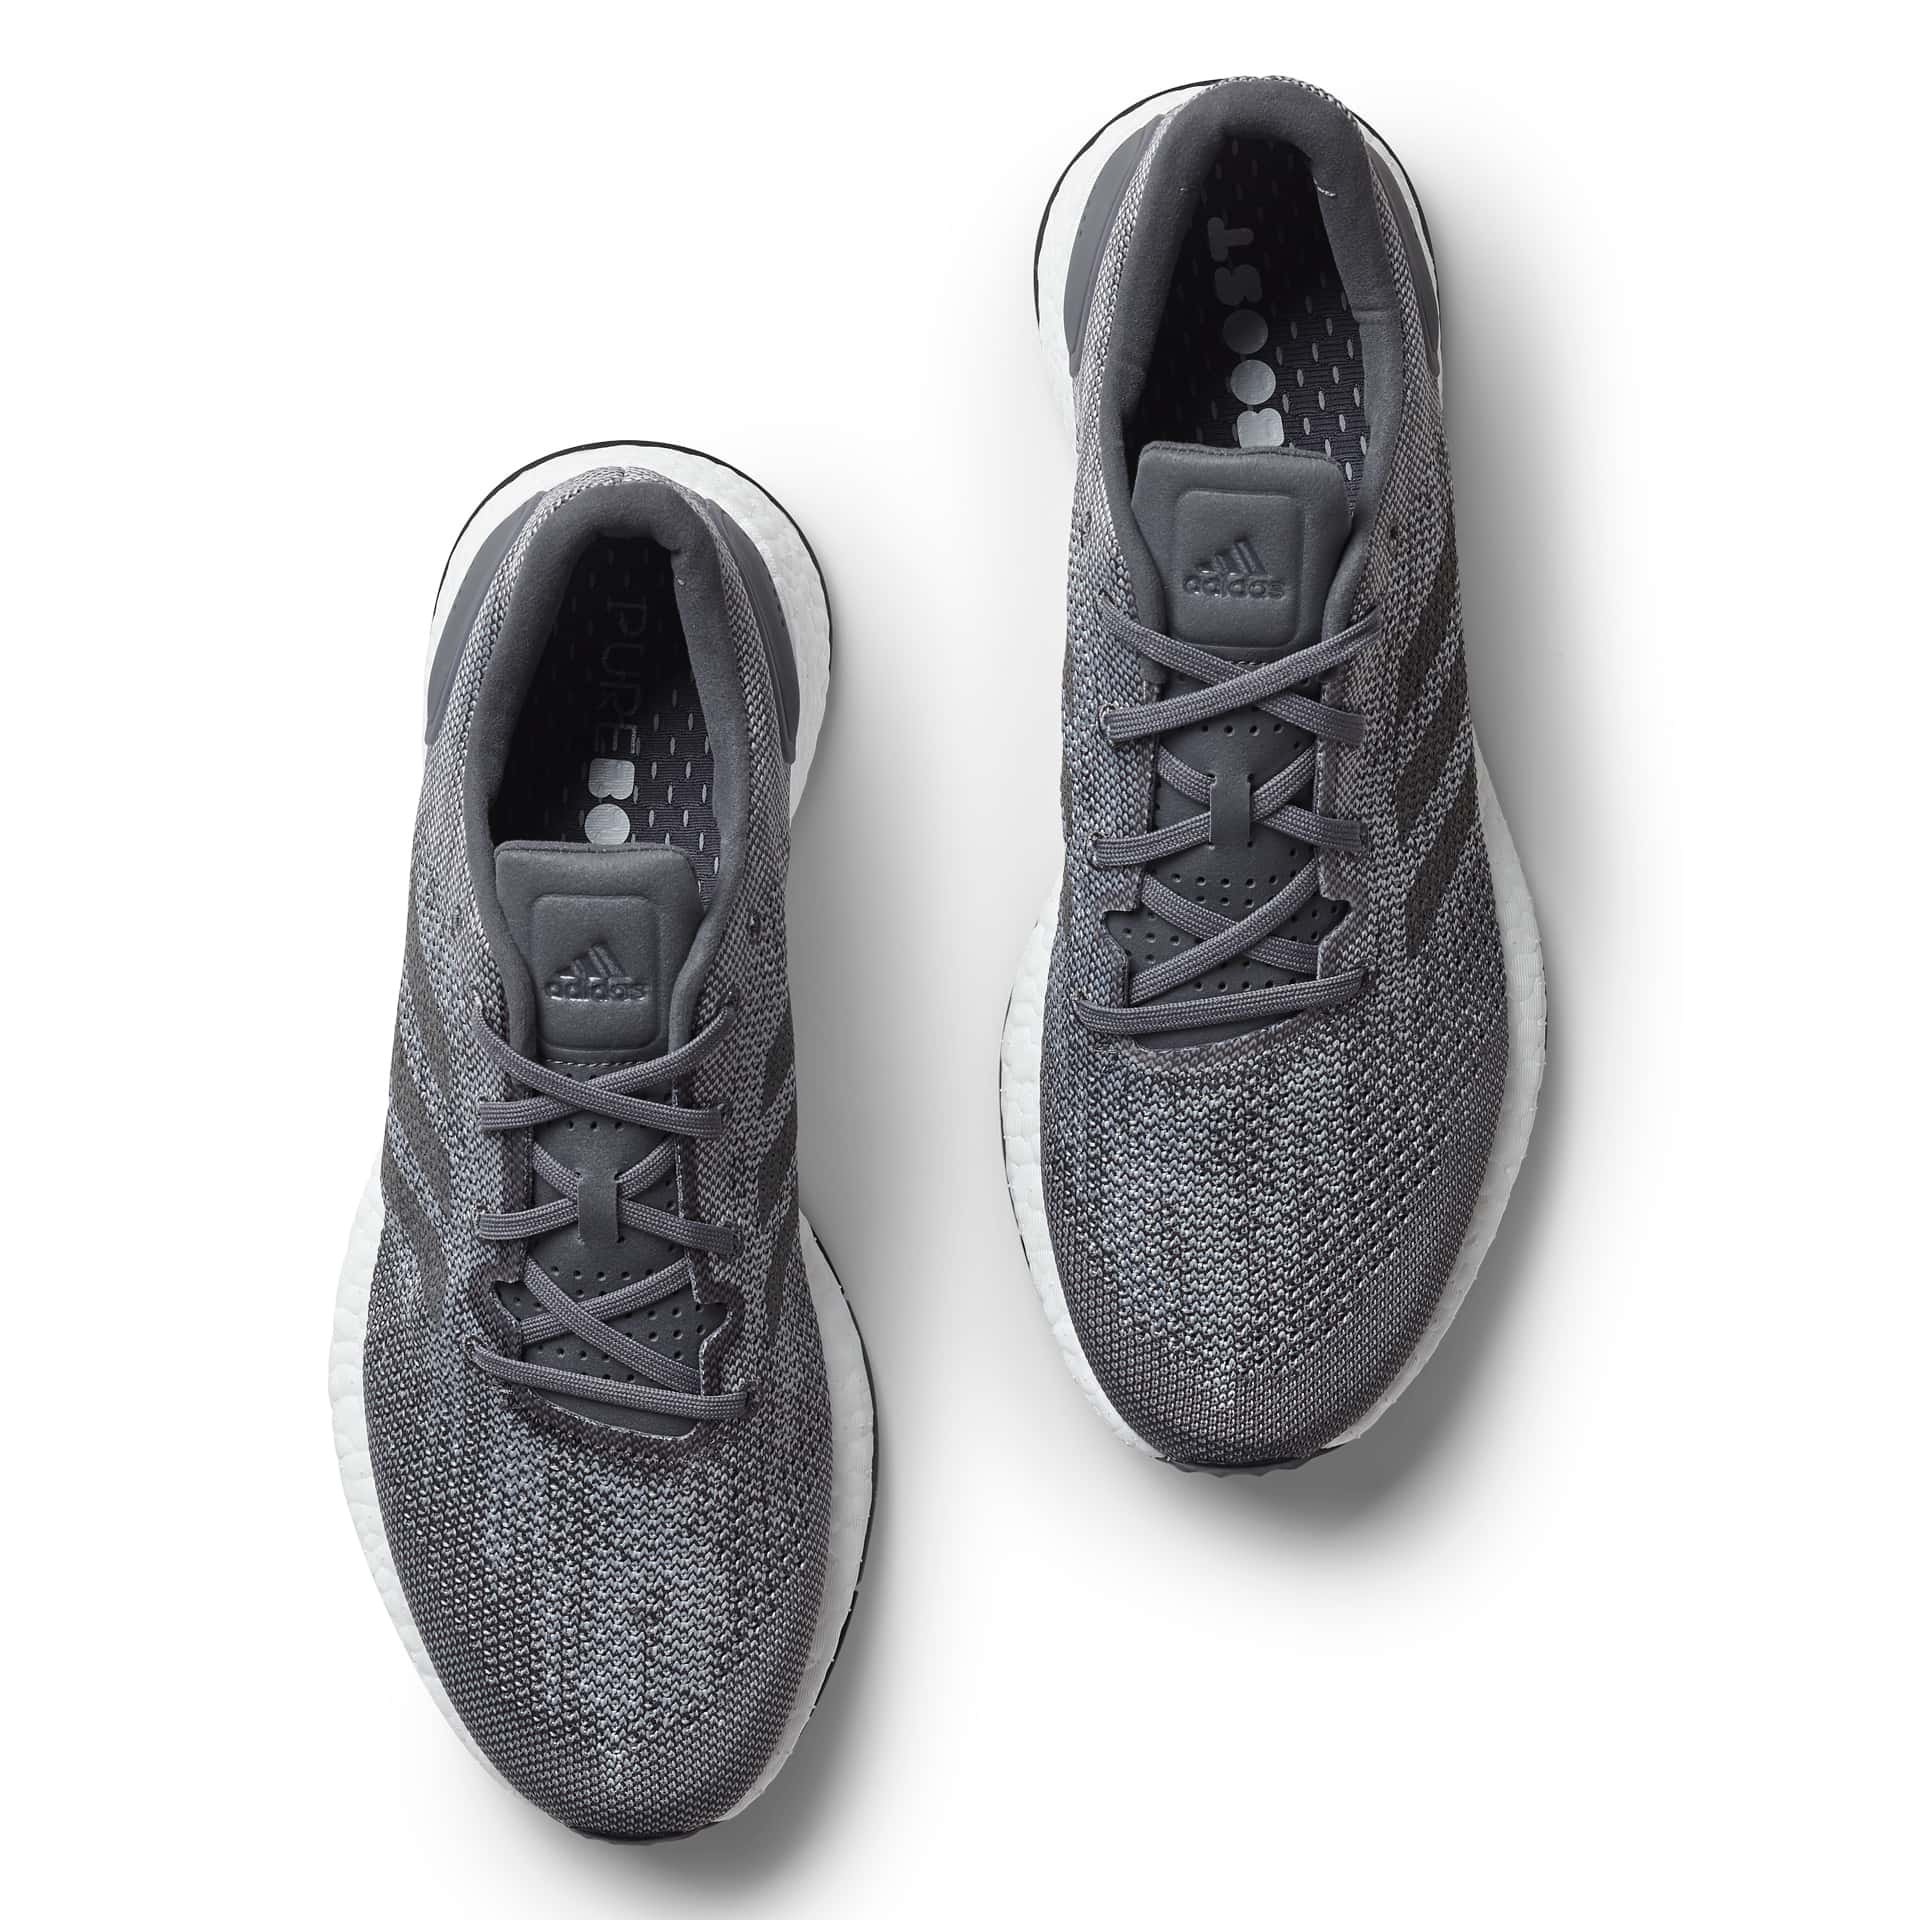 Forårssko-Sko_adidas_sko_1099,95kr_sport-point